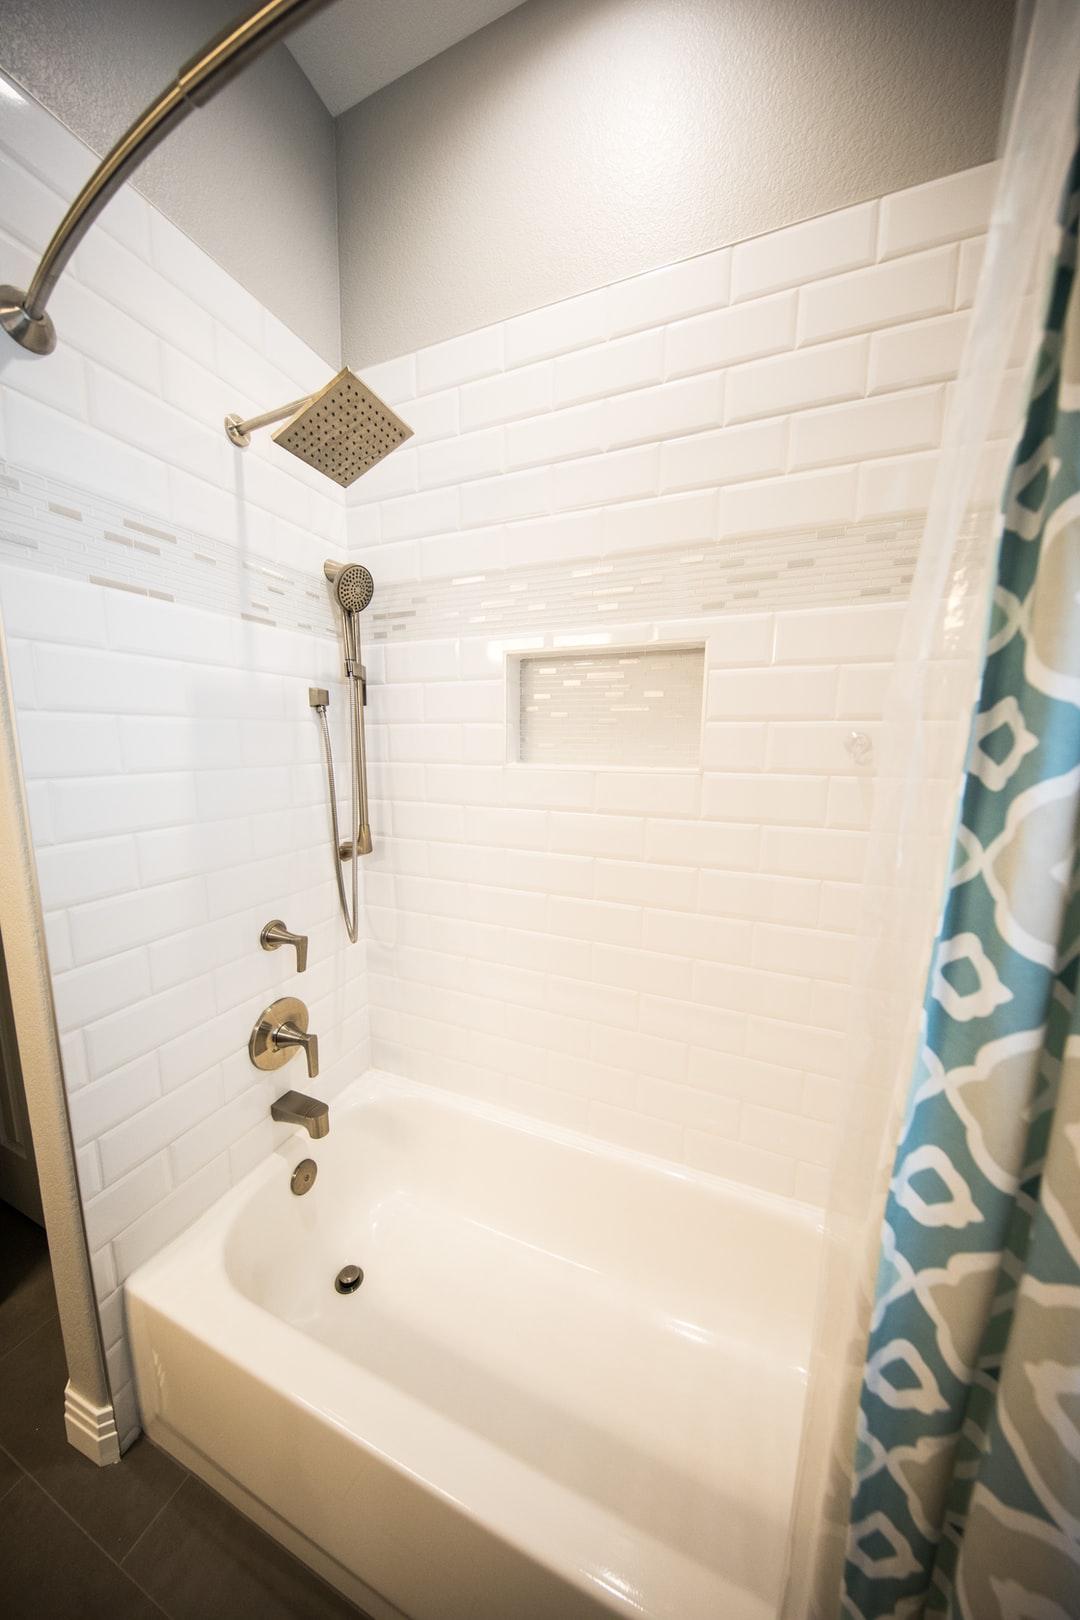 spokane bath replacement services